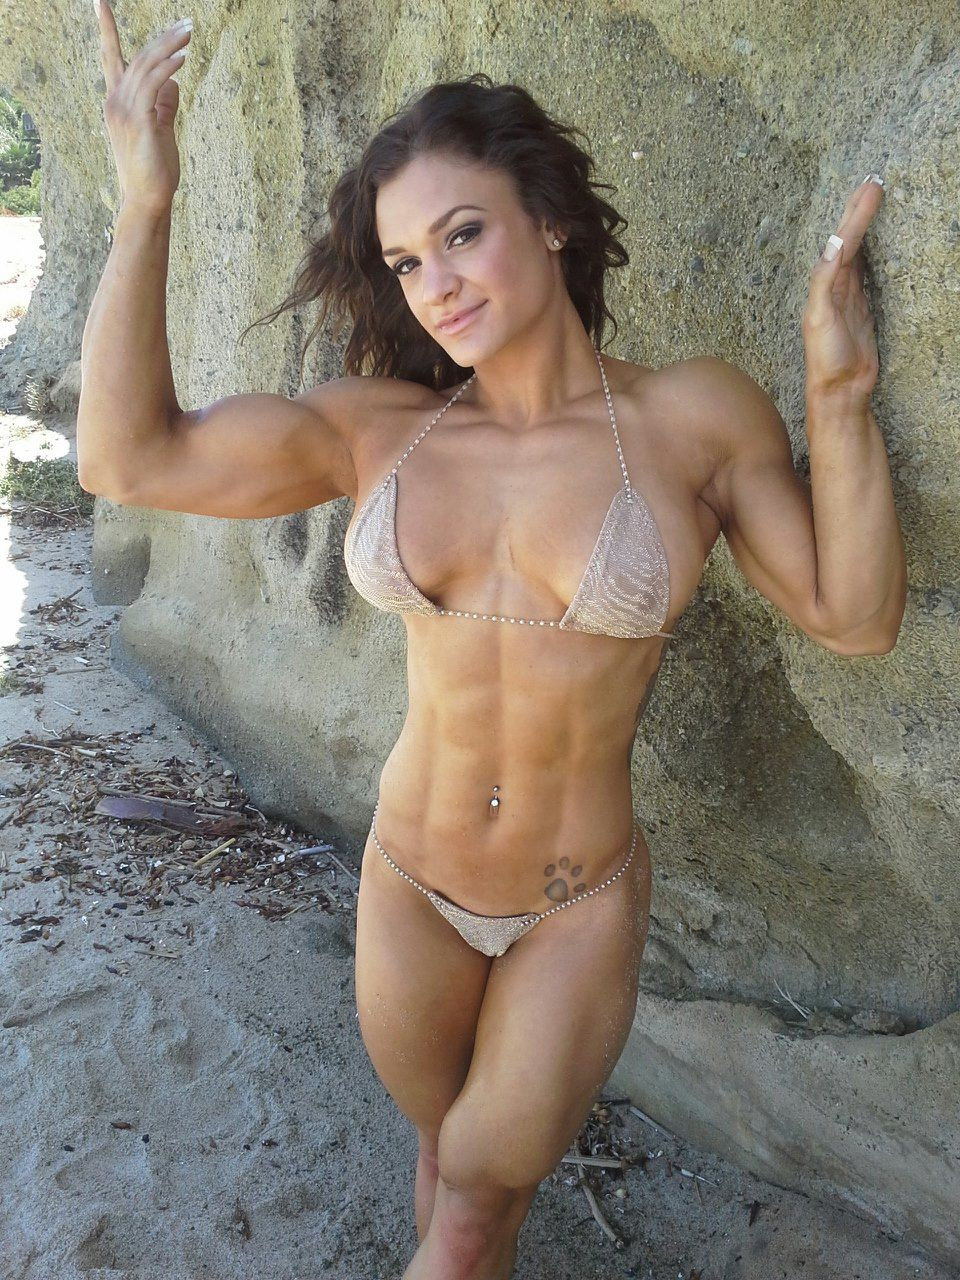 Hard body girl nude